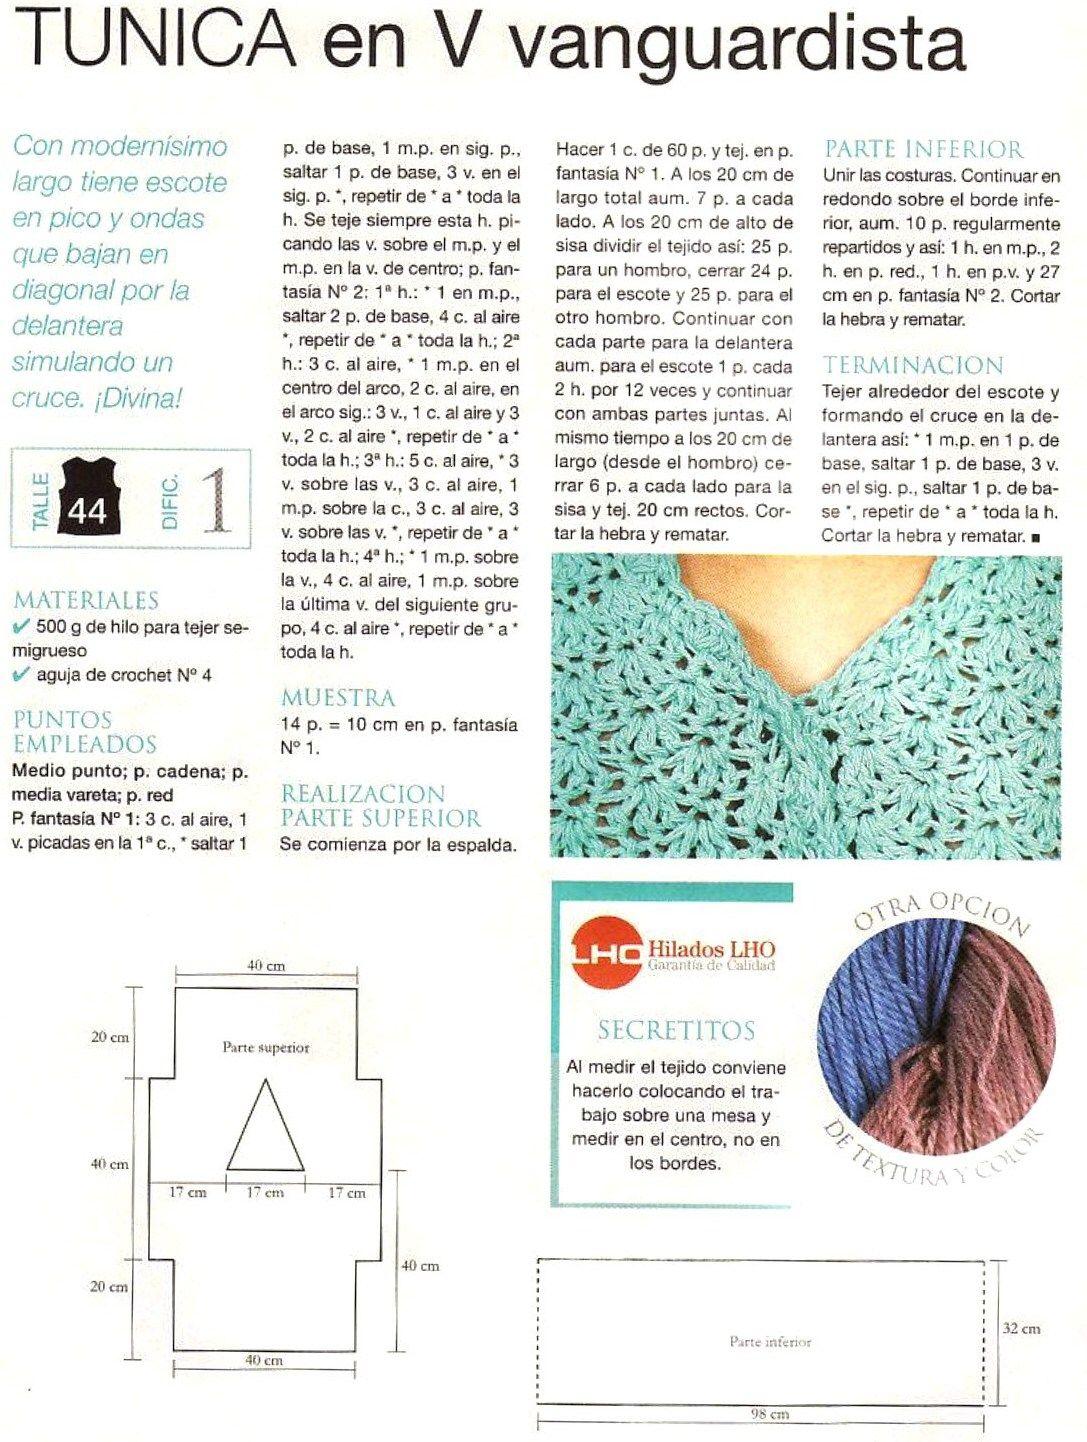 tunica-en-v-vanguardista-a-ganchillo-tutorial-02 | crochet ...